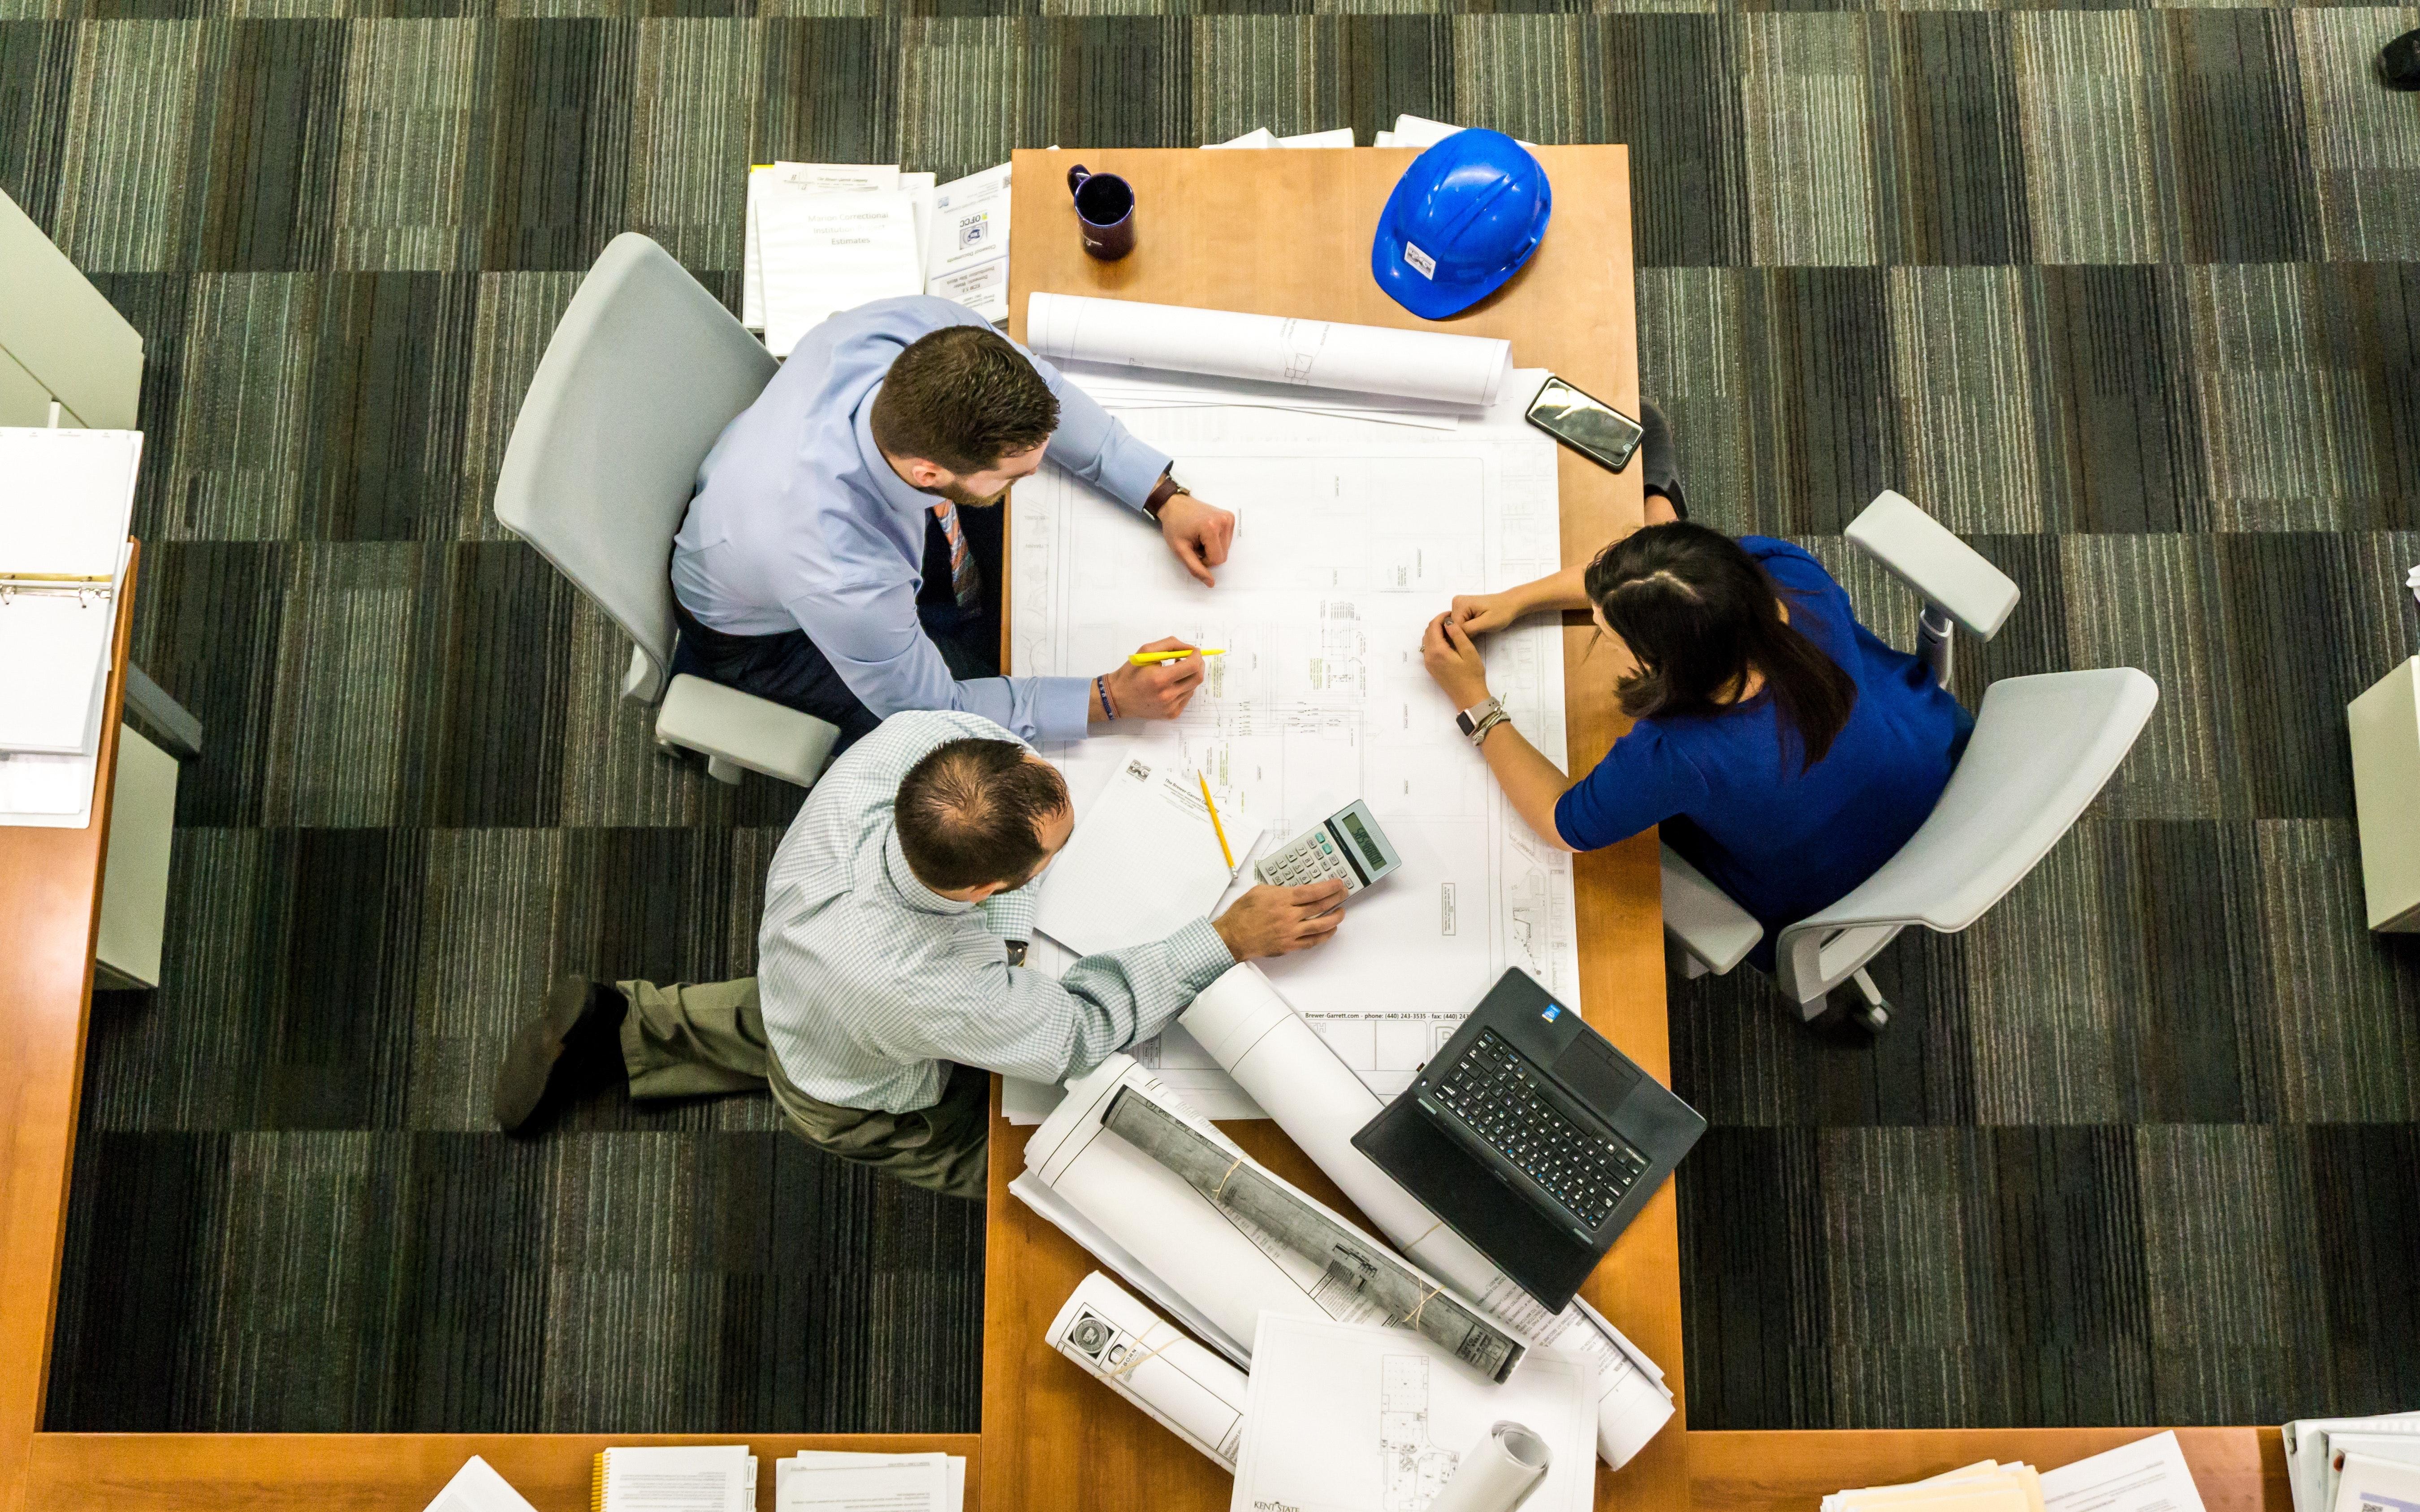 Facility management stress